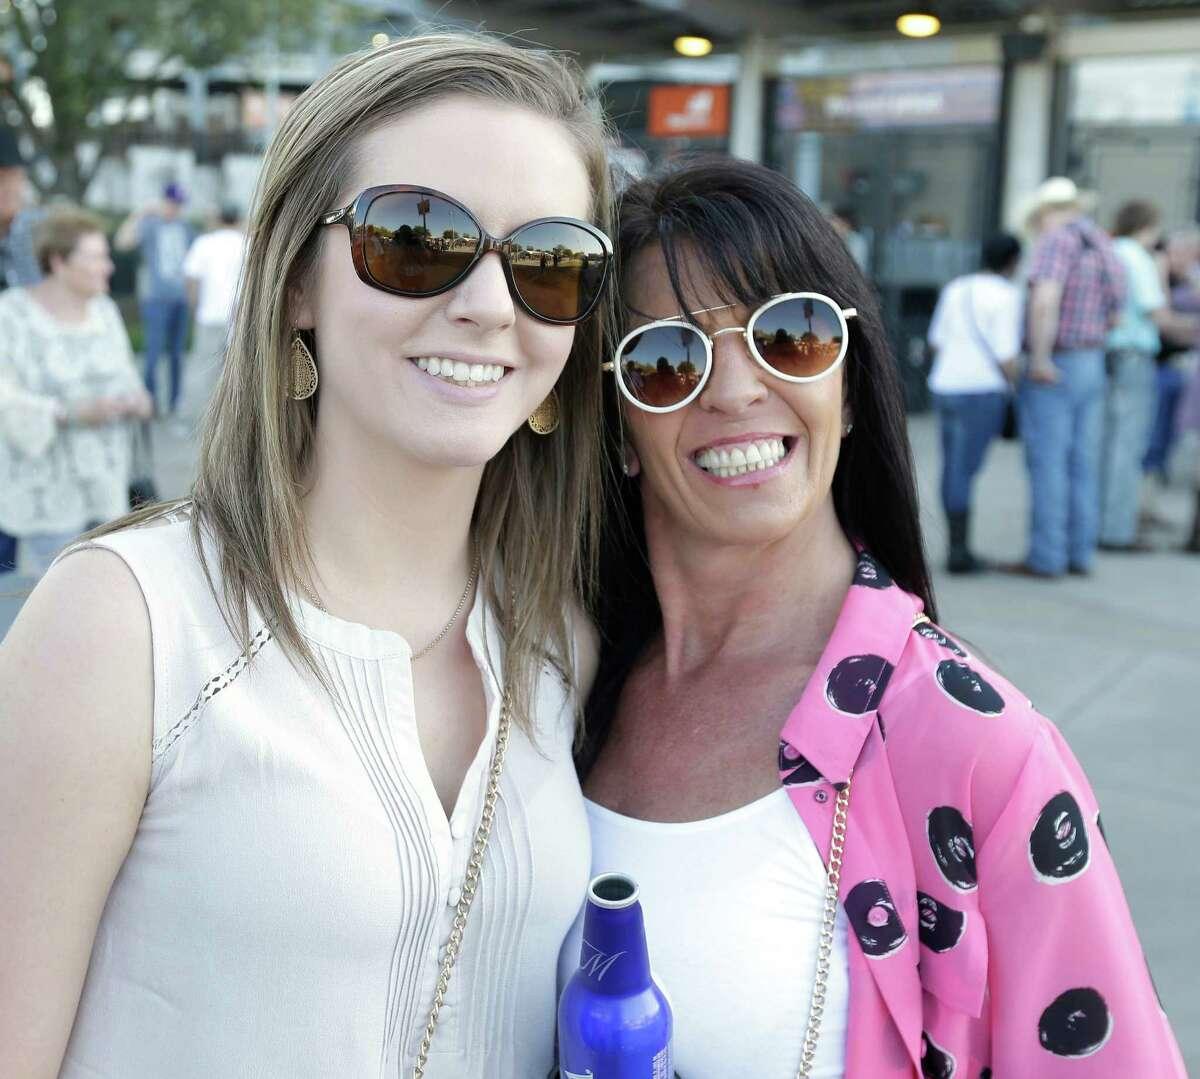 Kenny Chesney fans at RodeoHouston on Monday.